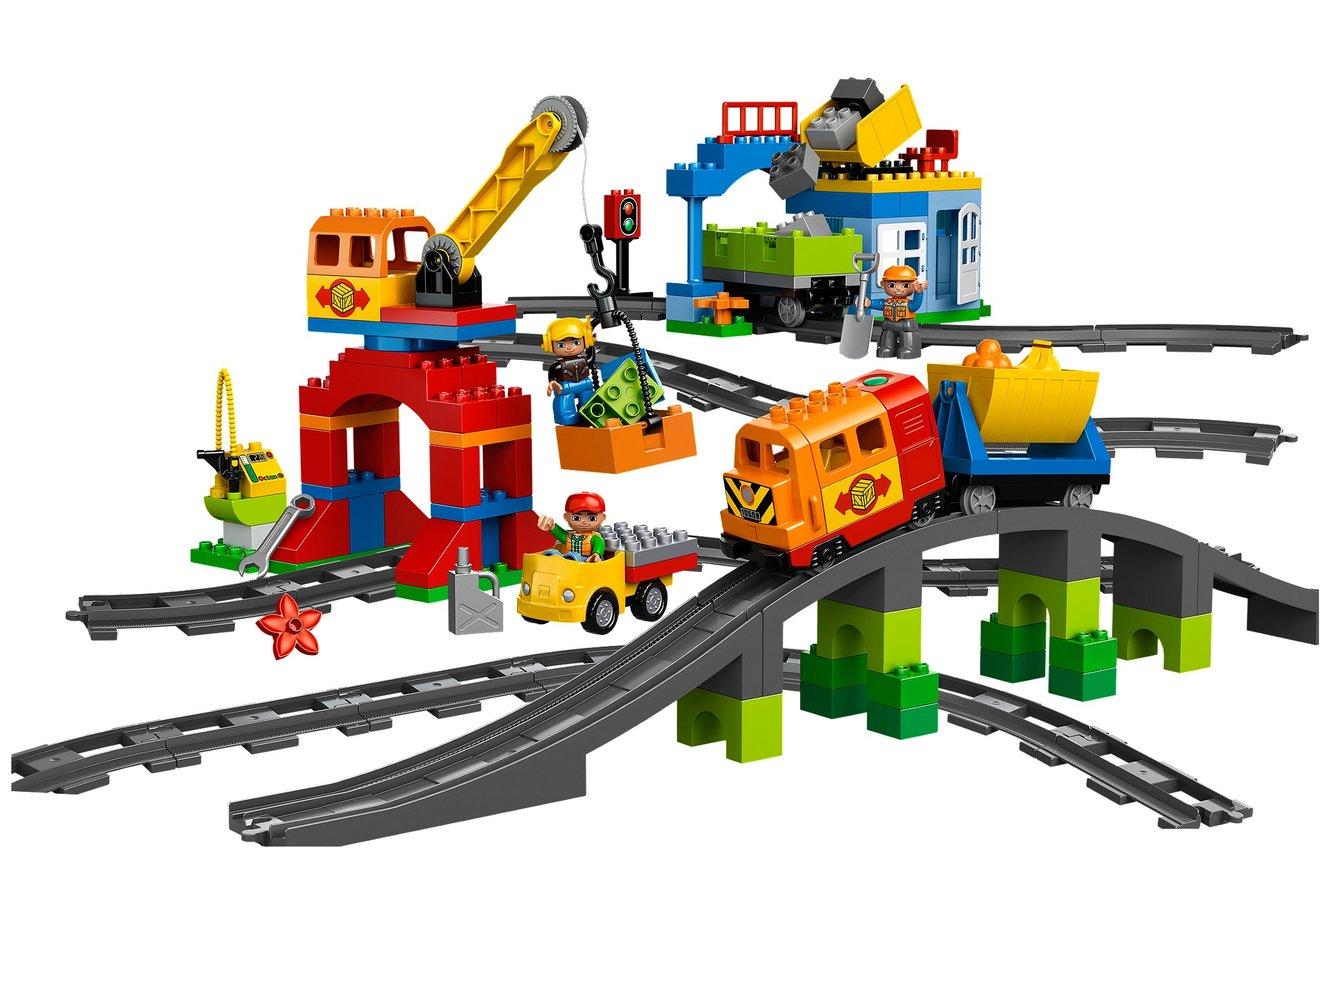 Deluxe Train Set